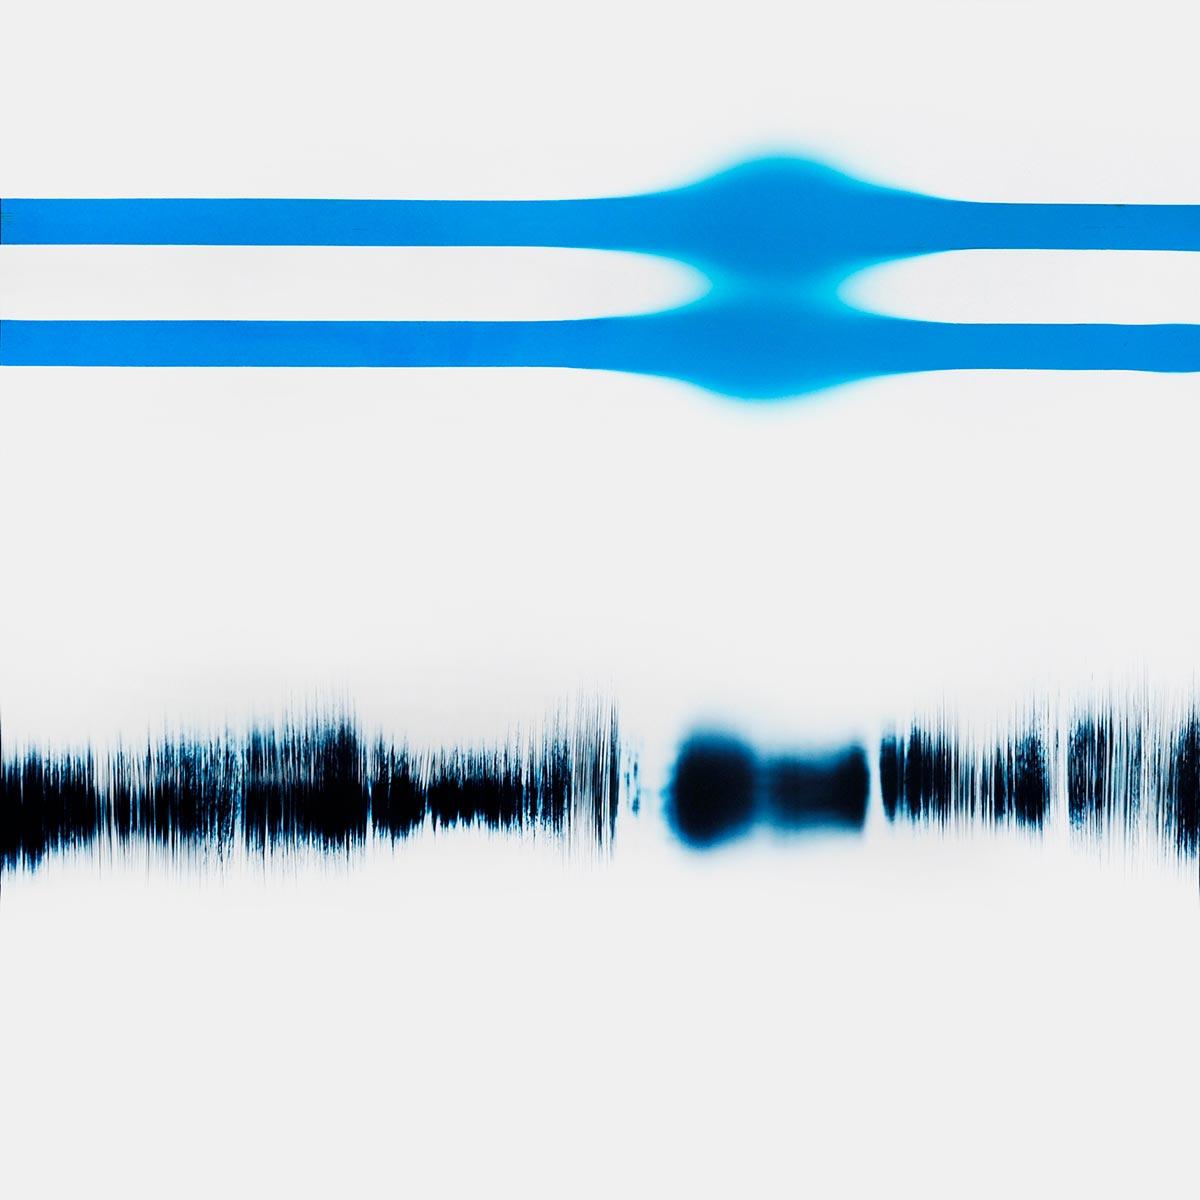 minimalist color photogram titled: Optimal Inflection, by artist Richard Slechta